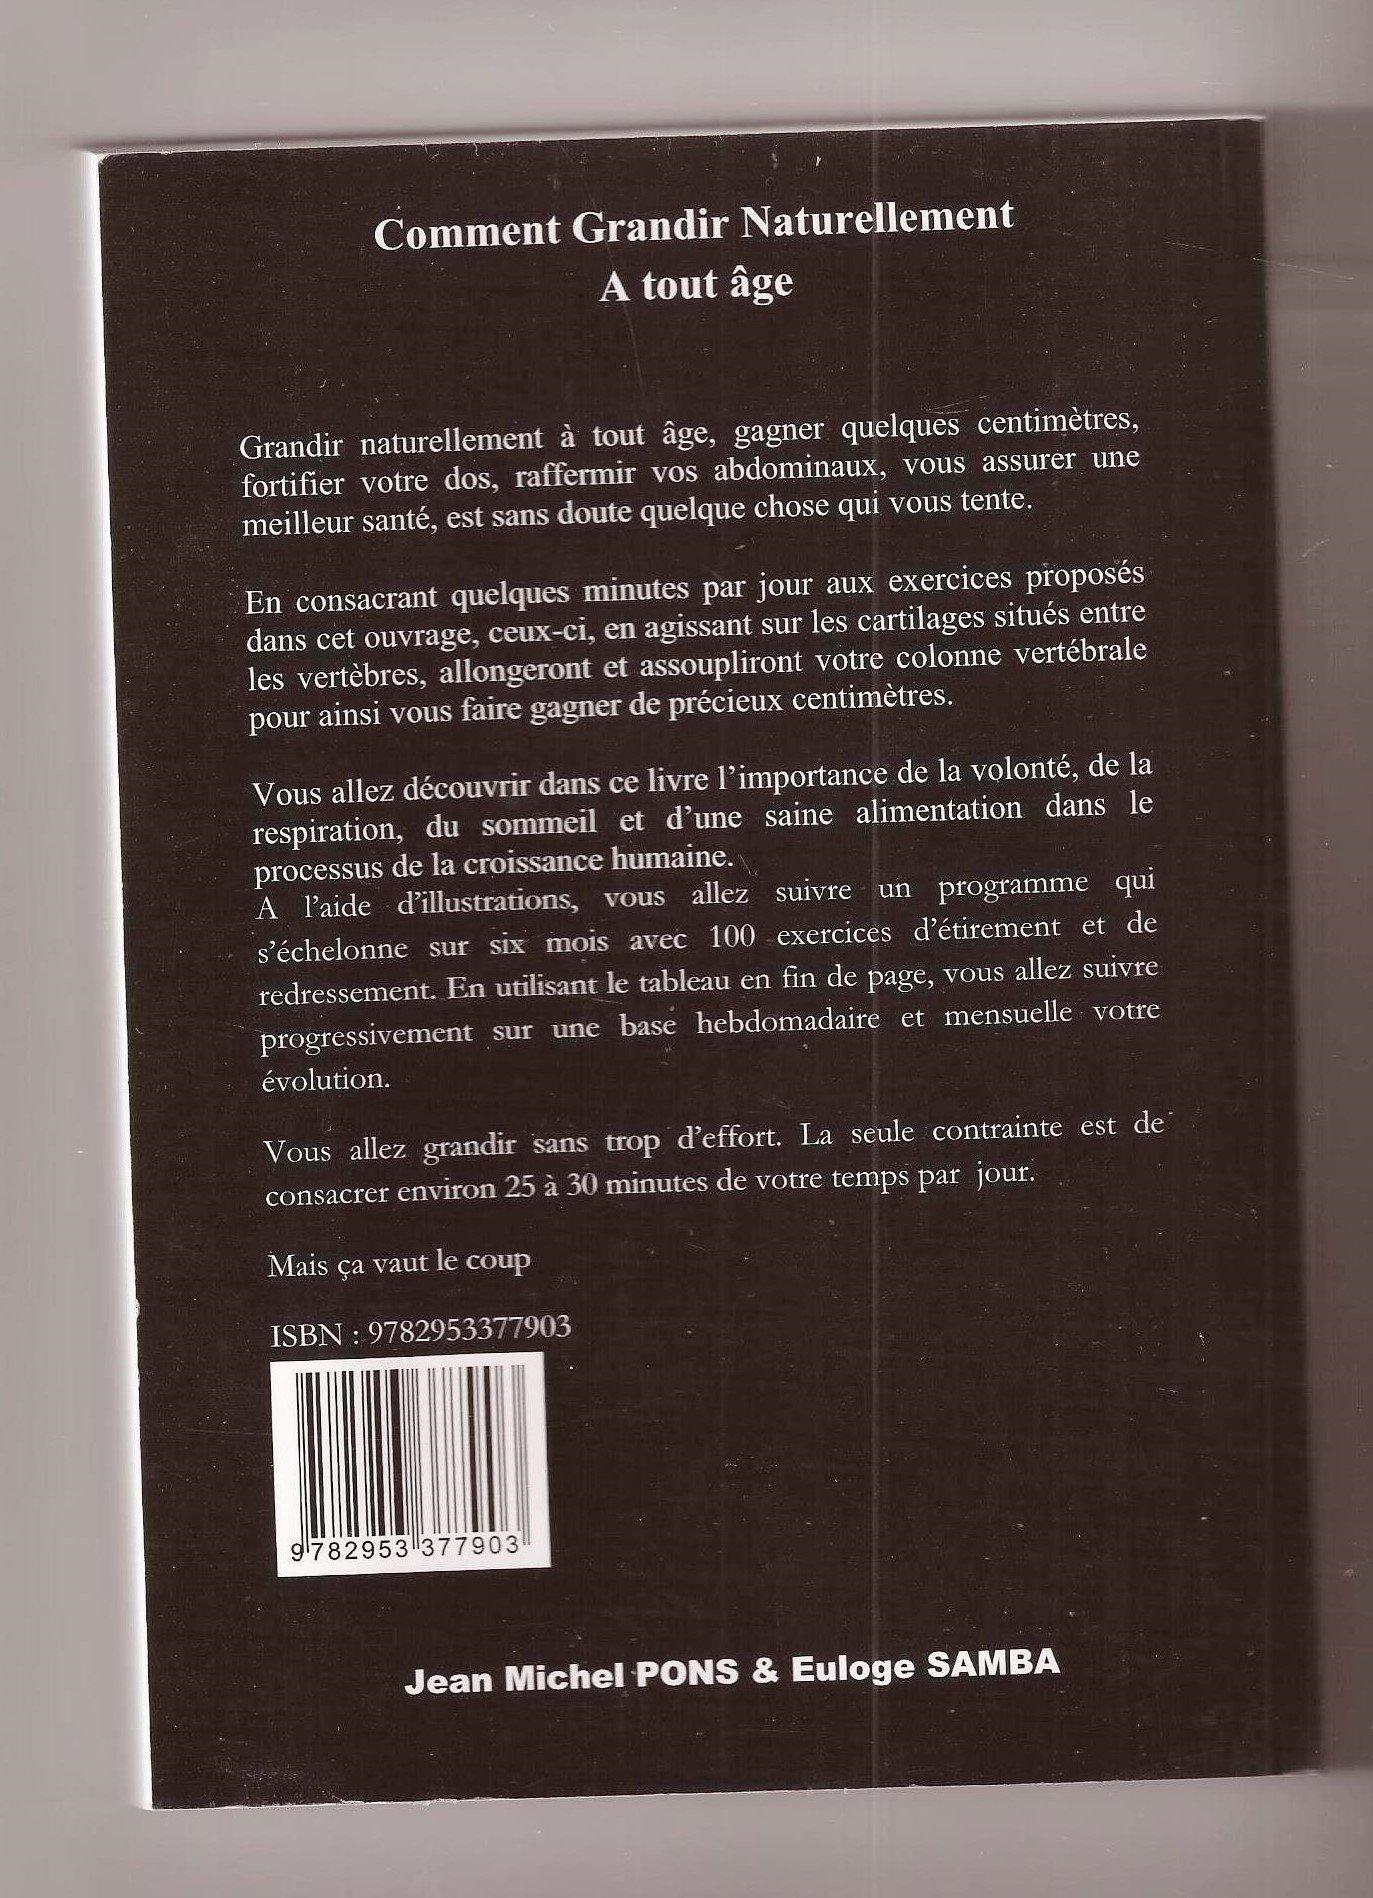 Amazon Fr Comment Grandir Naturellement A Tout Age Jean Michel Pons Euloge Samba Euloge Samba Livres